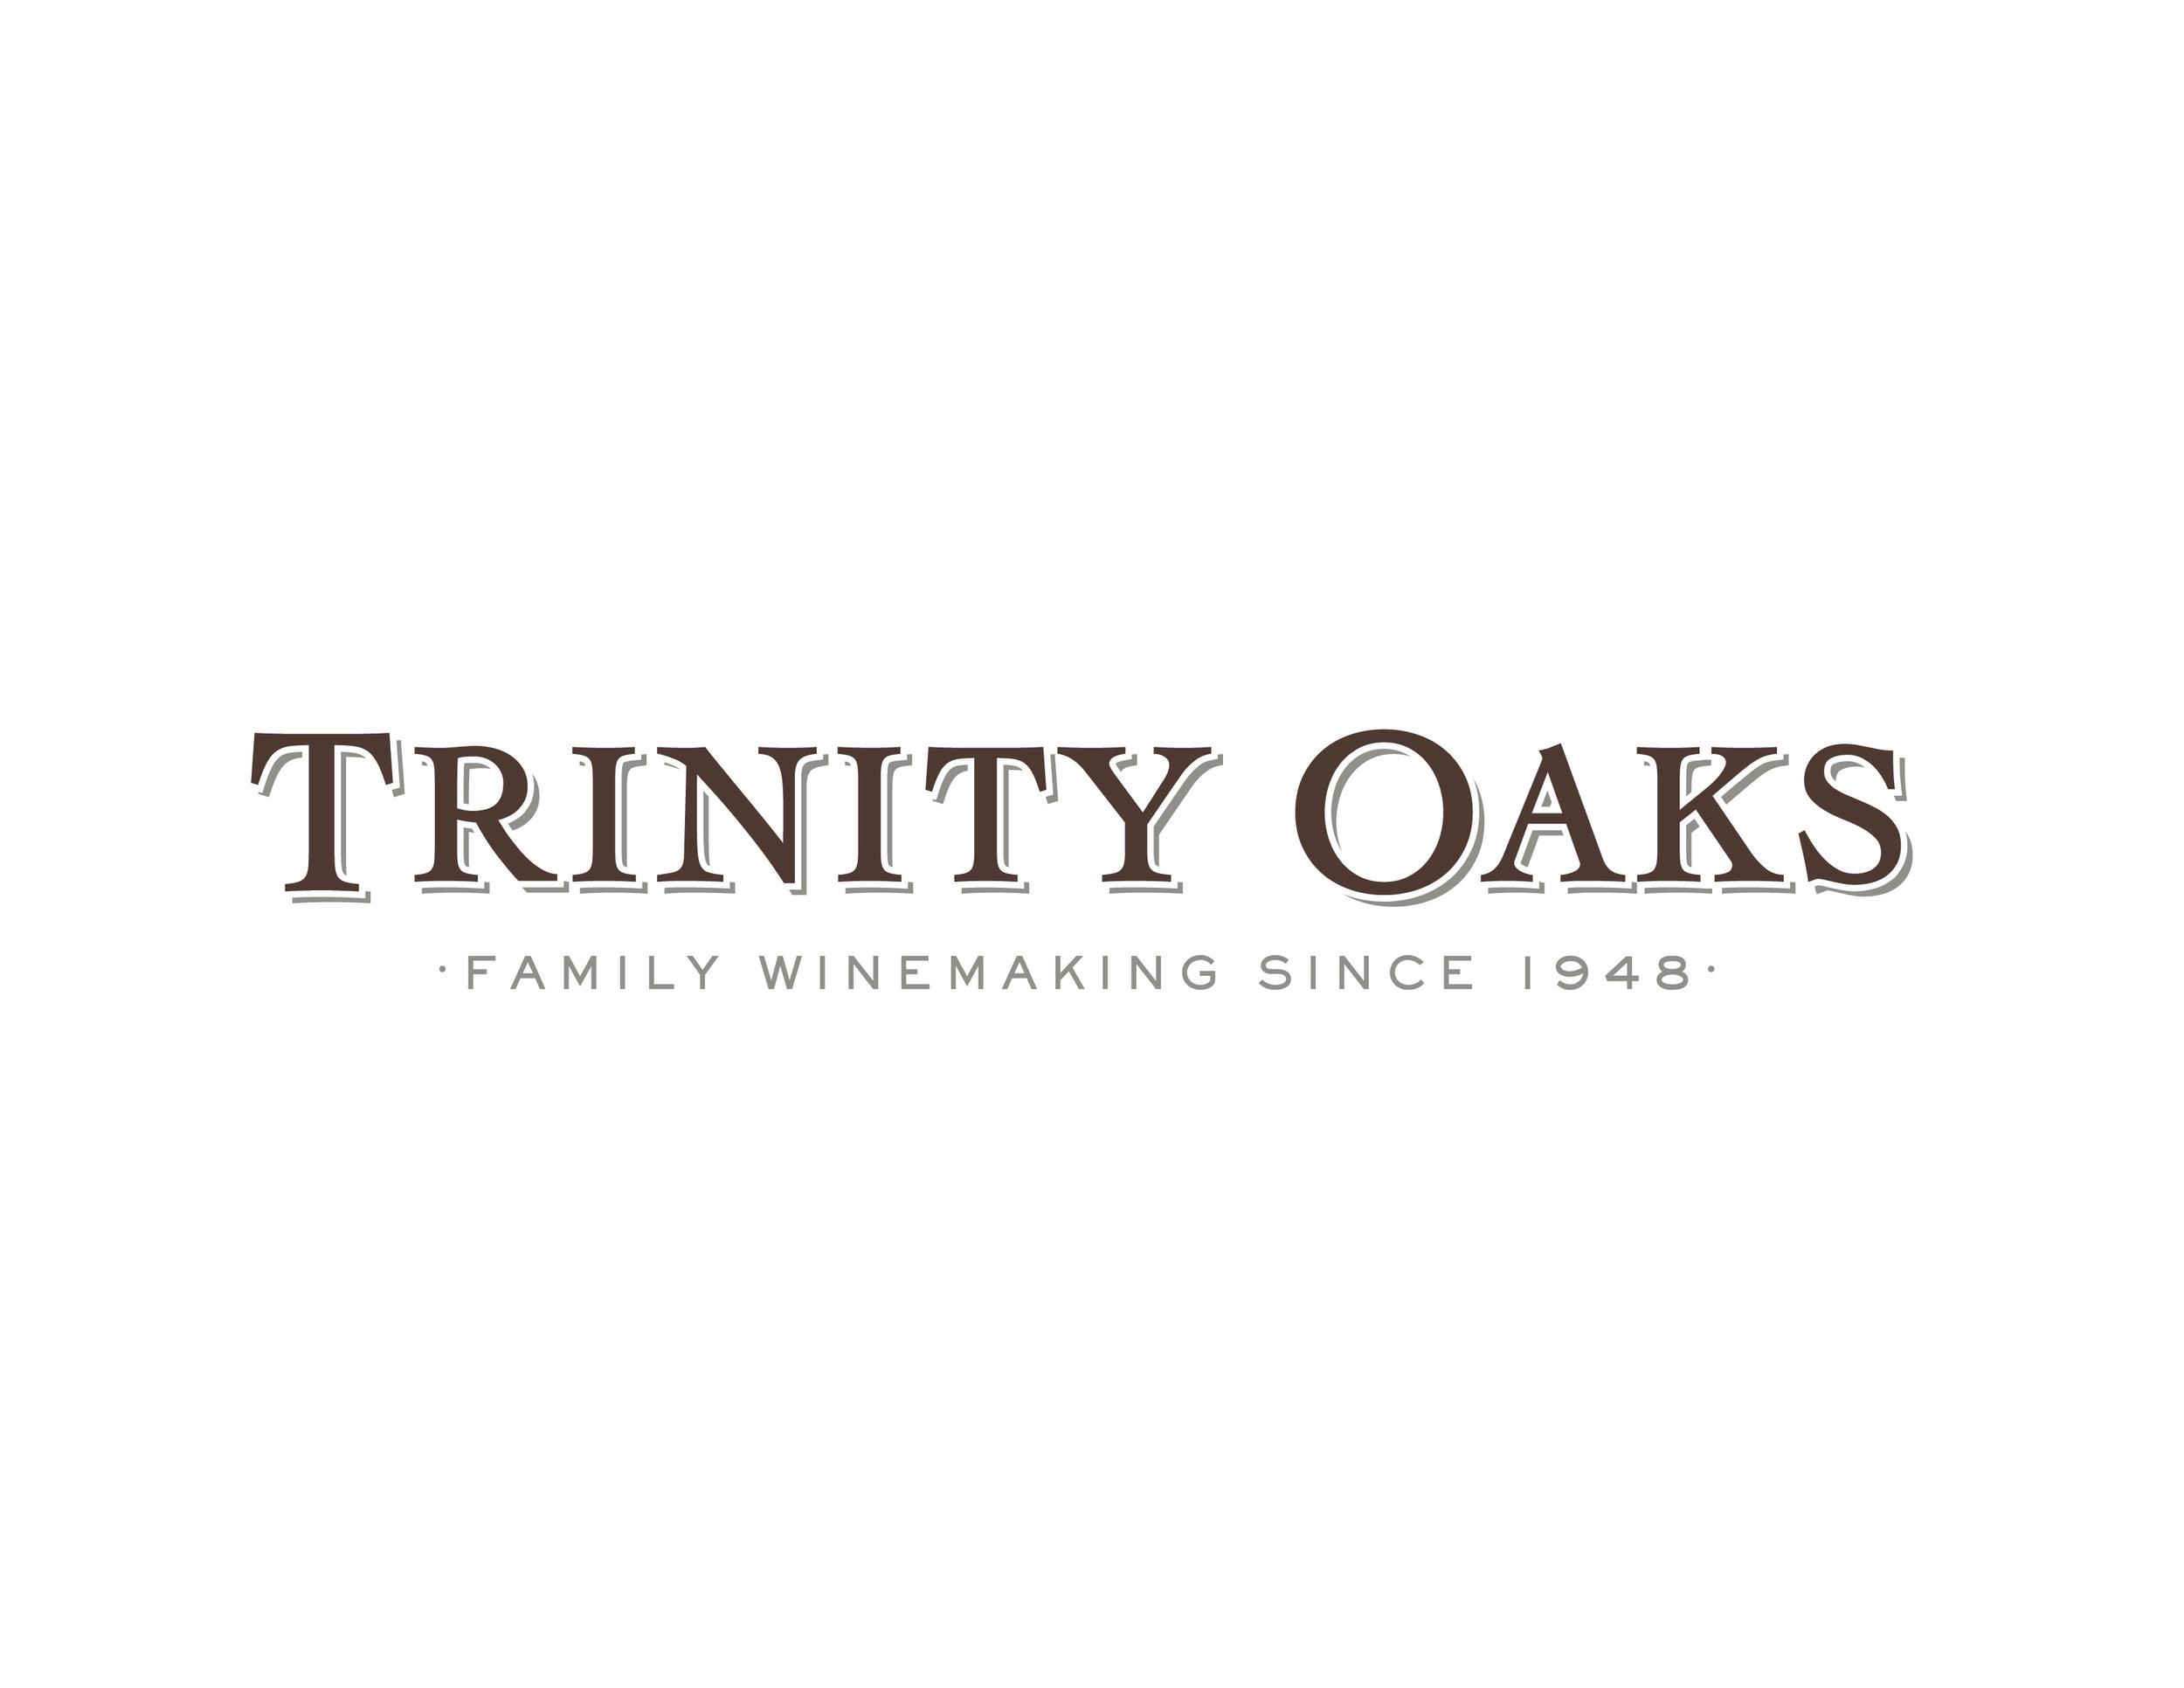 trinity oaks-12.jpg